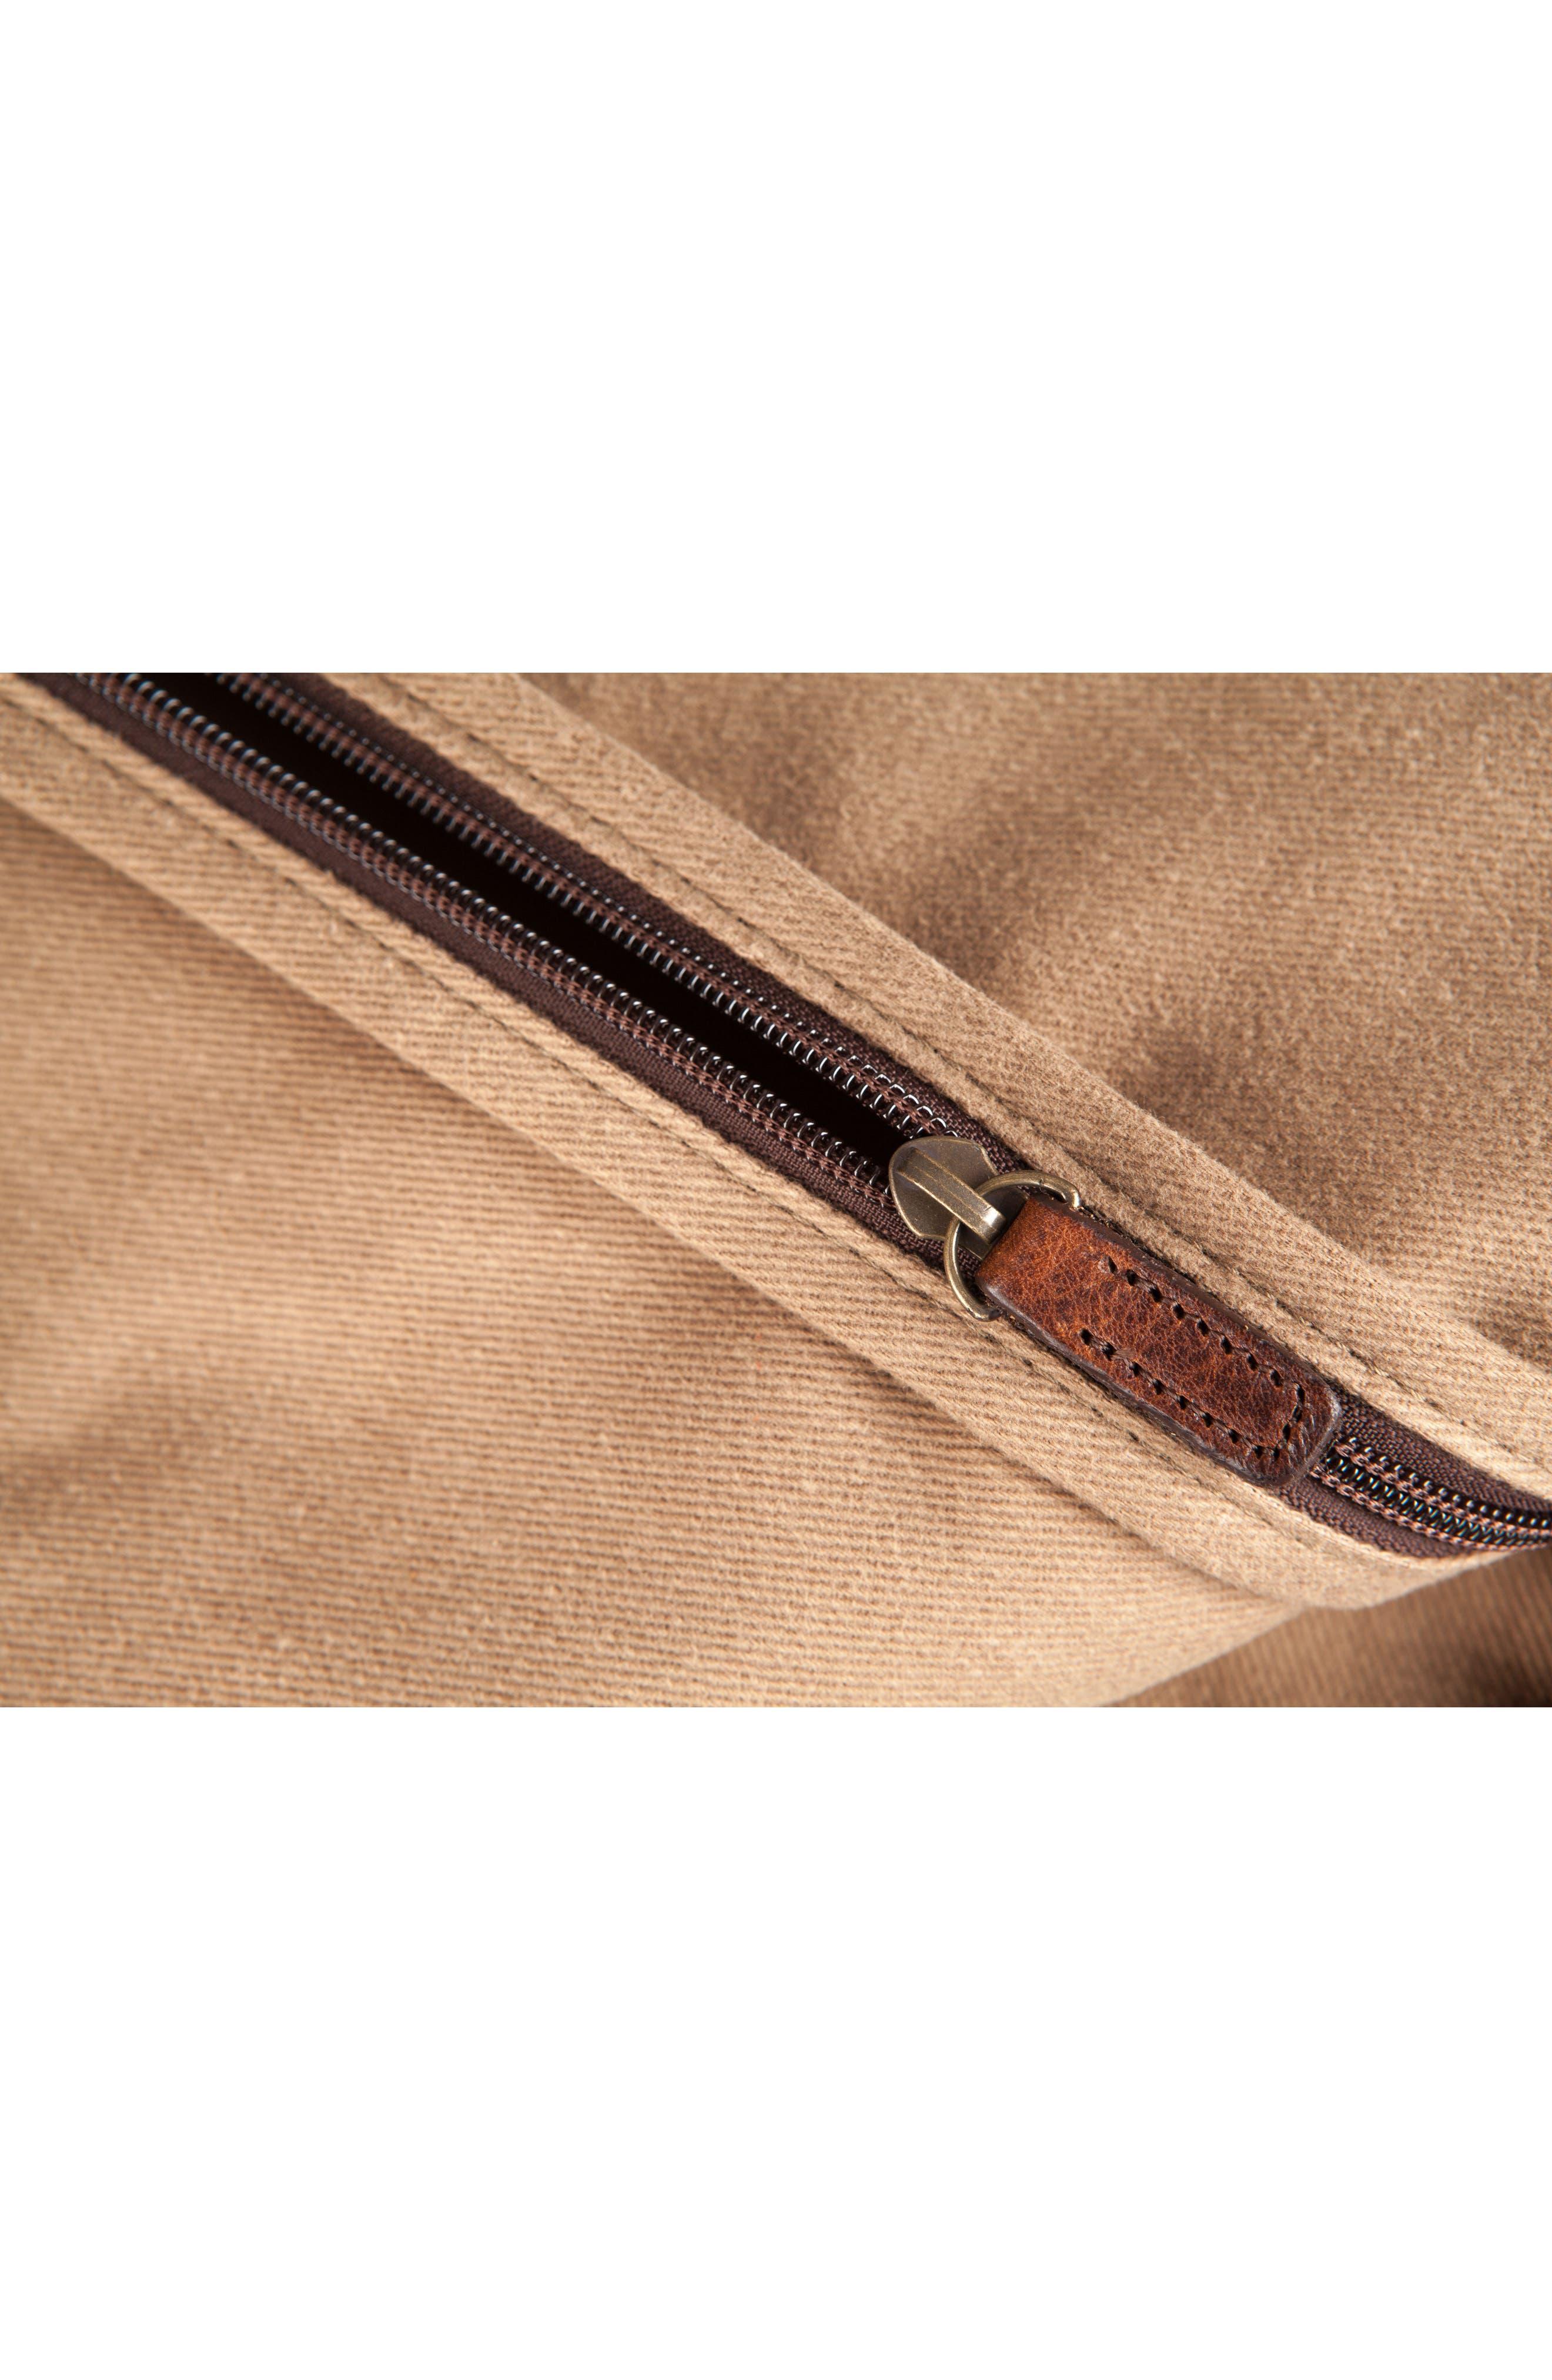 Holton Garment Bag,                             Alternate thumbnail 2, color,                             206